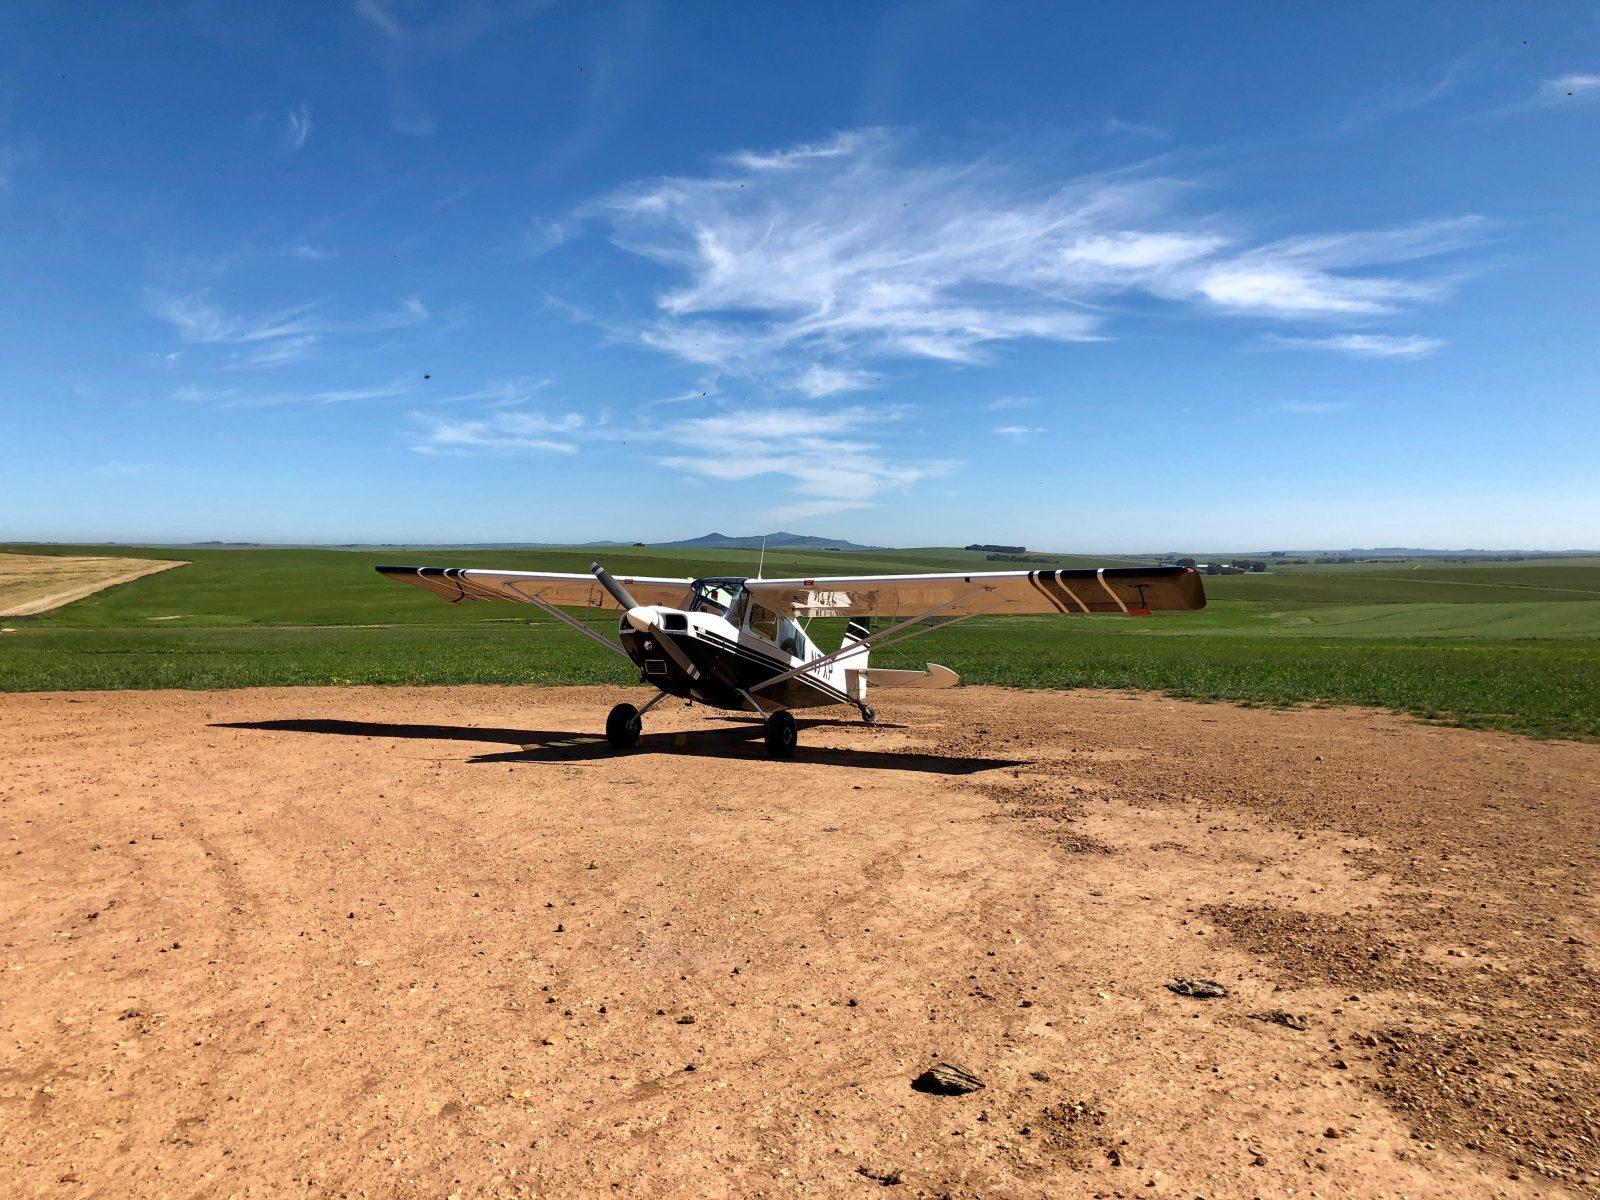 Farm landing peacefulness.